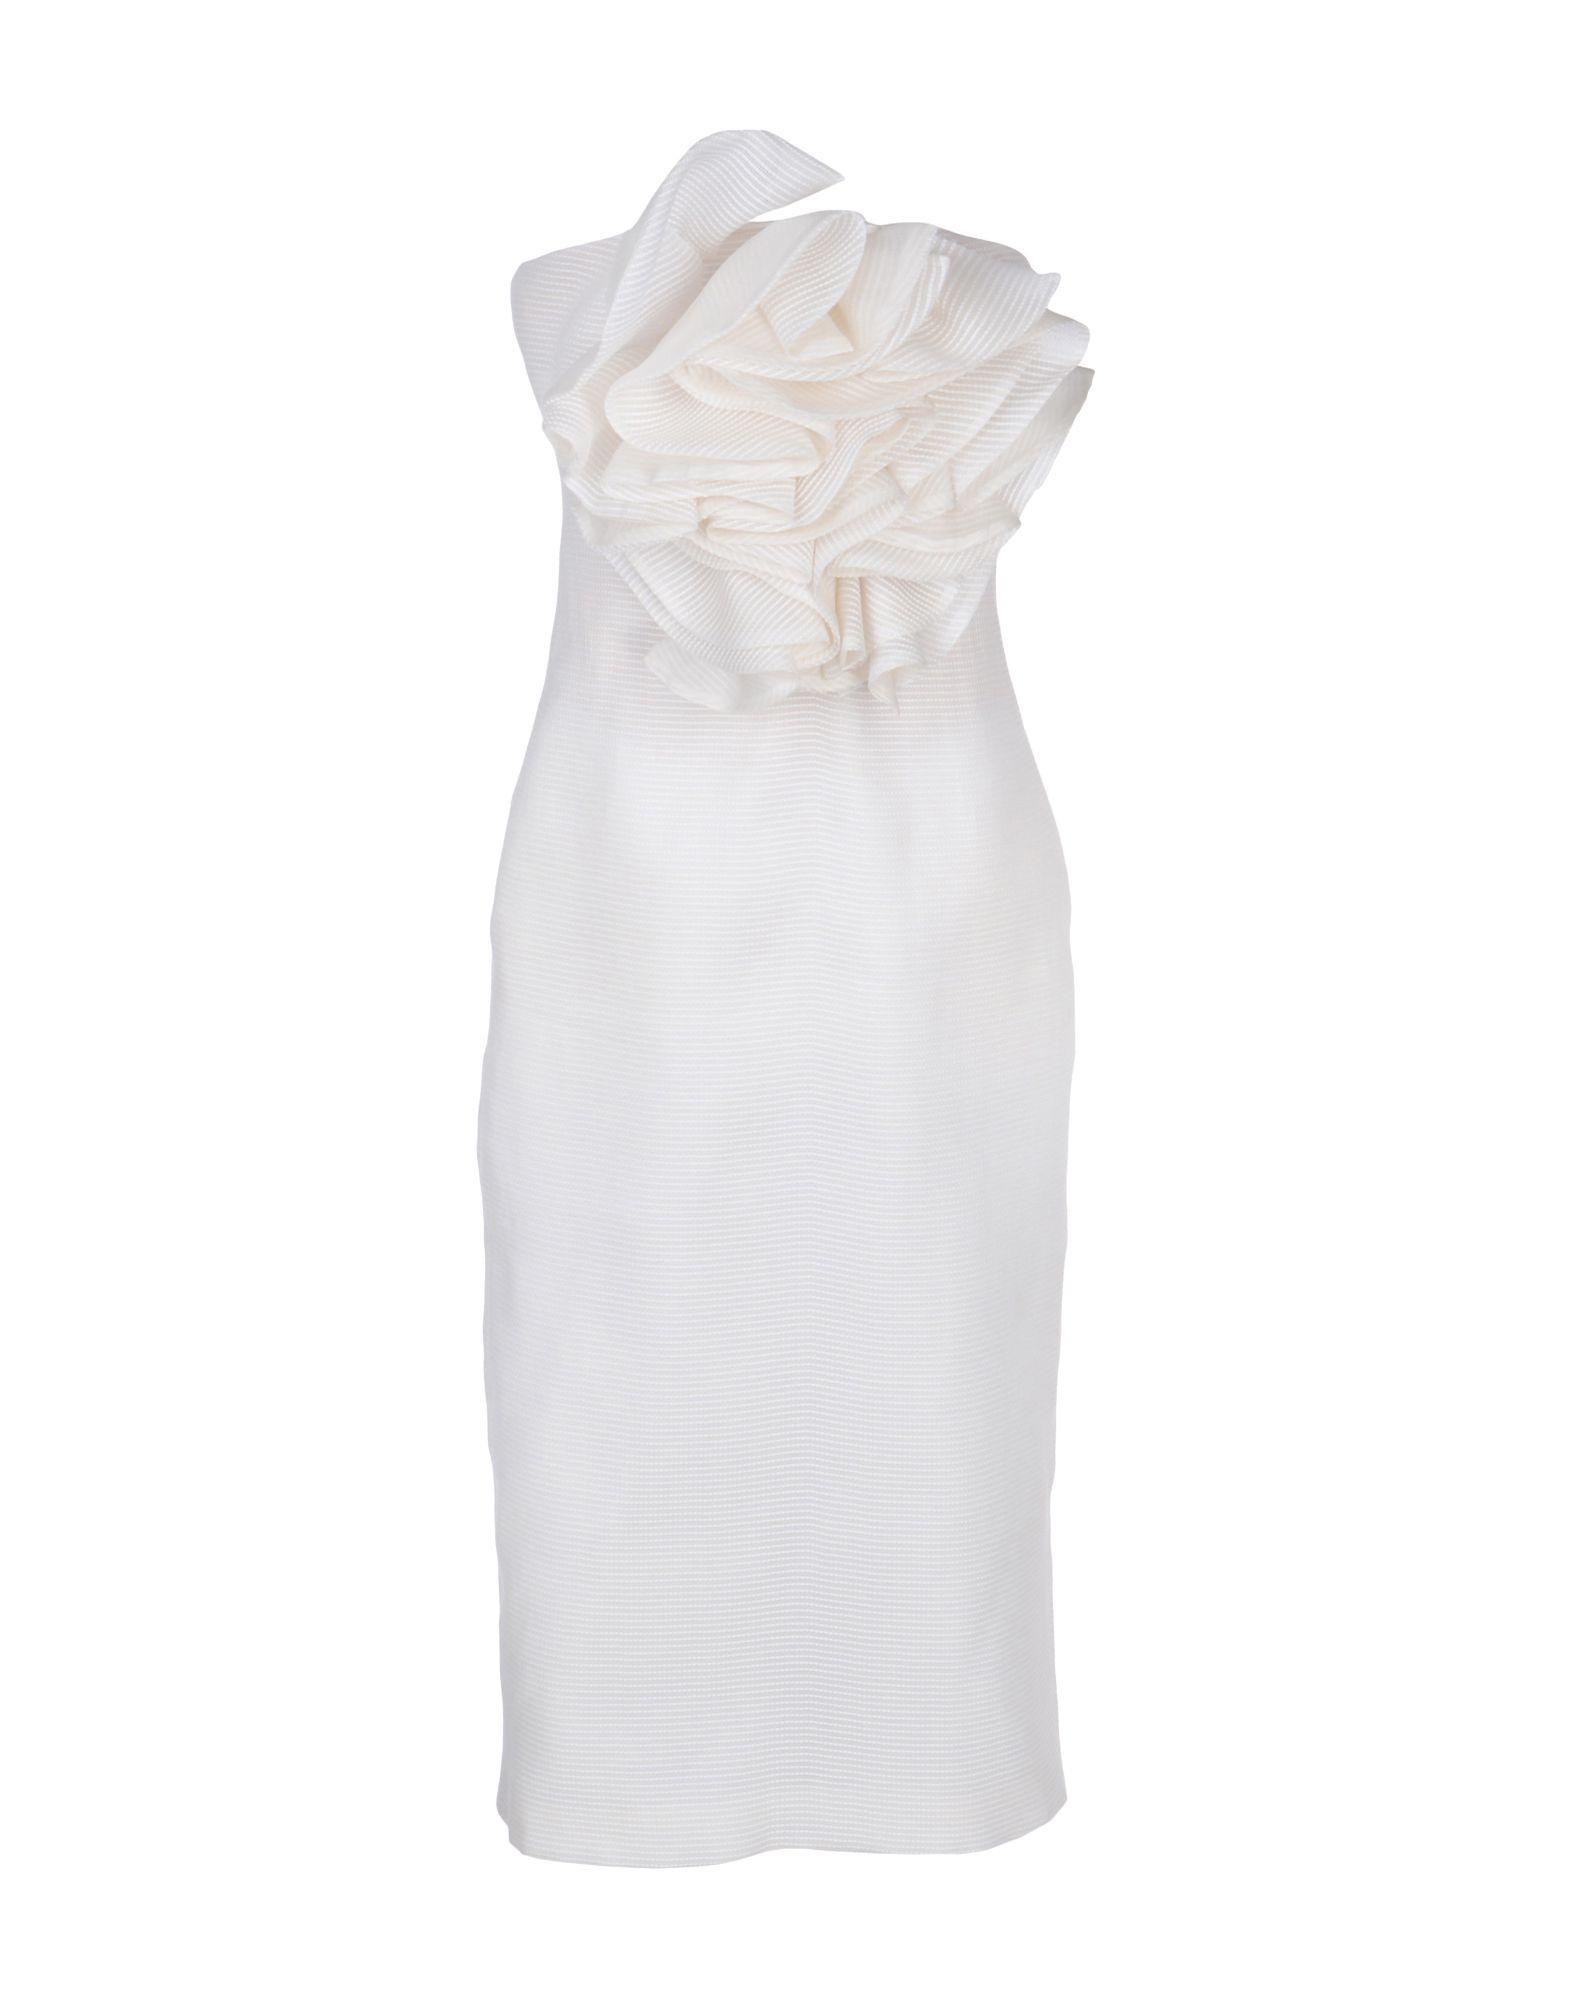 THE 2ND SKIN CO Платье длиной 3/4 nd yag laser parts 3 65 3 120 4 120 5 85 8 185 nd yag laser rod for nd yag laser machine